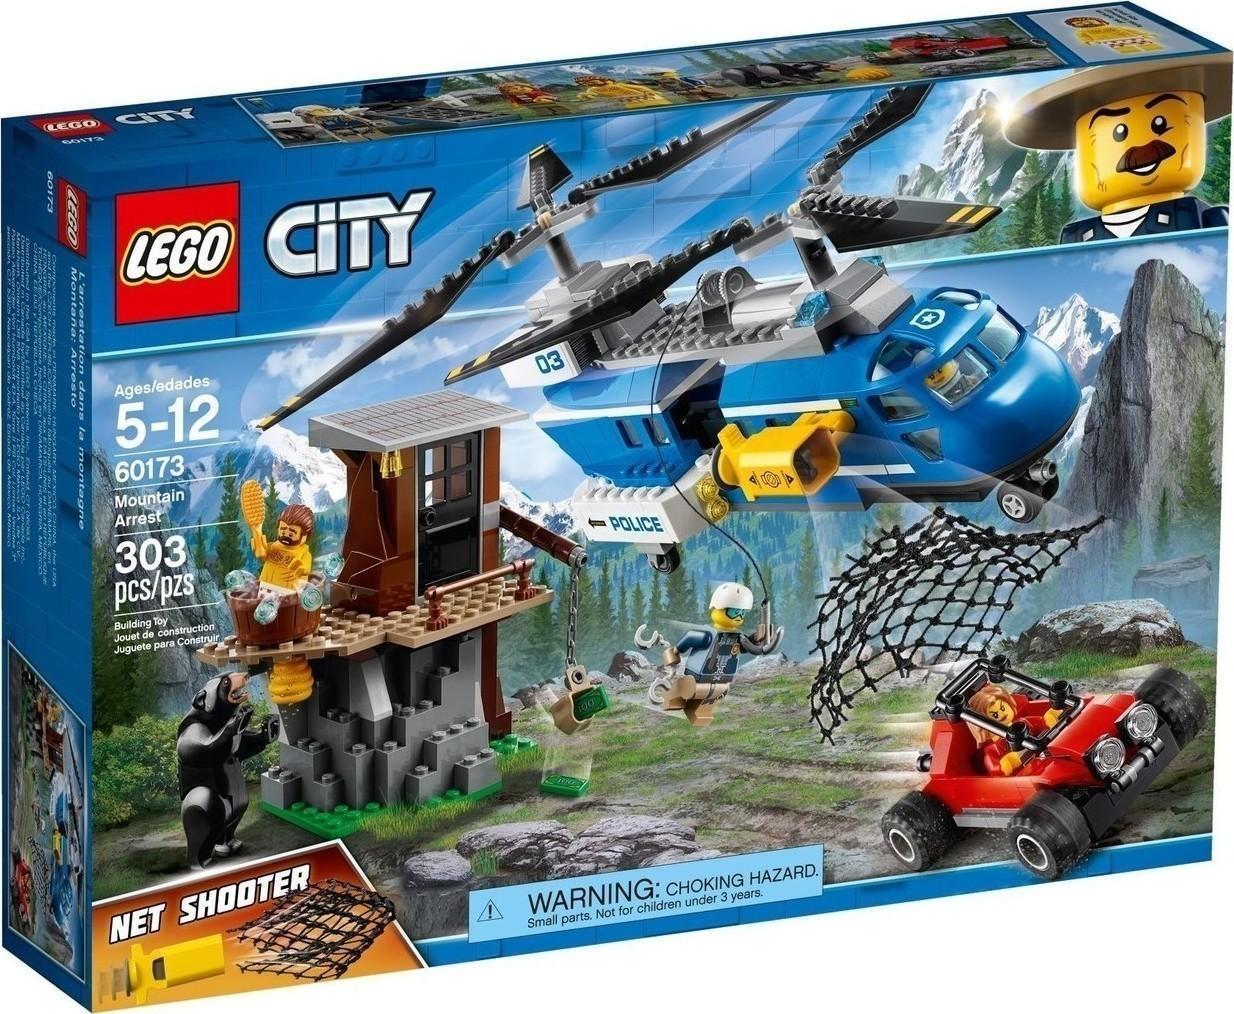 Lego City: Mountain Arrest 60173